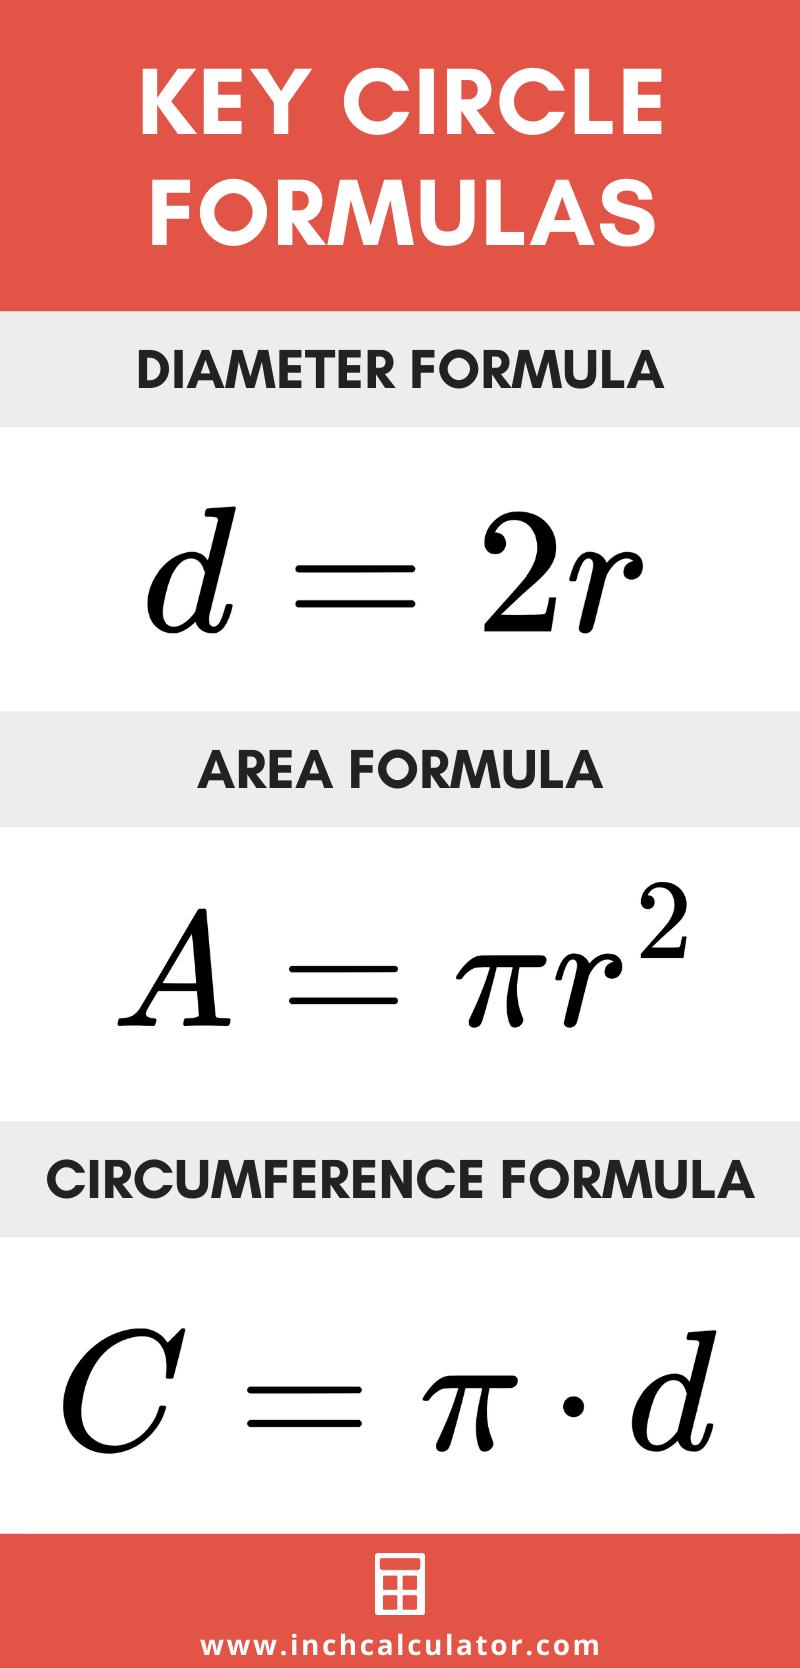 Share circle calculator – find radius, circumference, & area